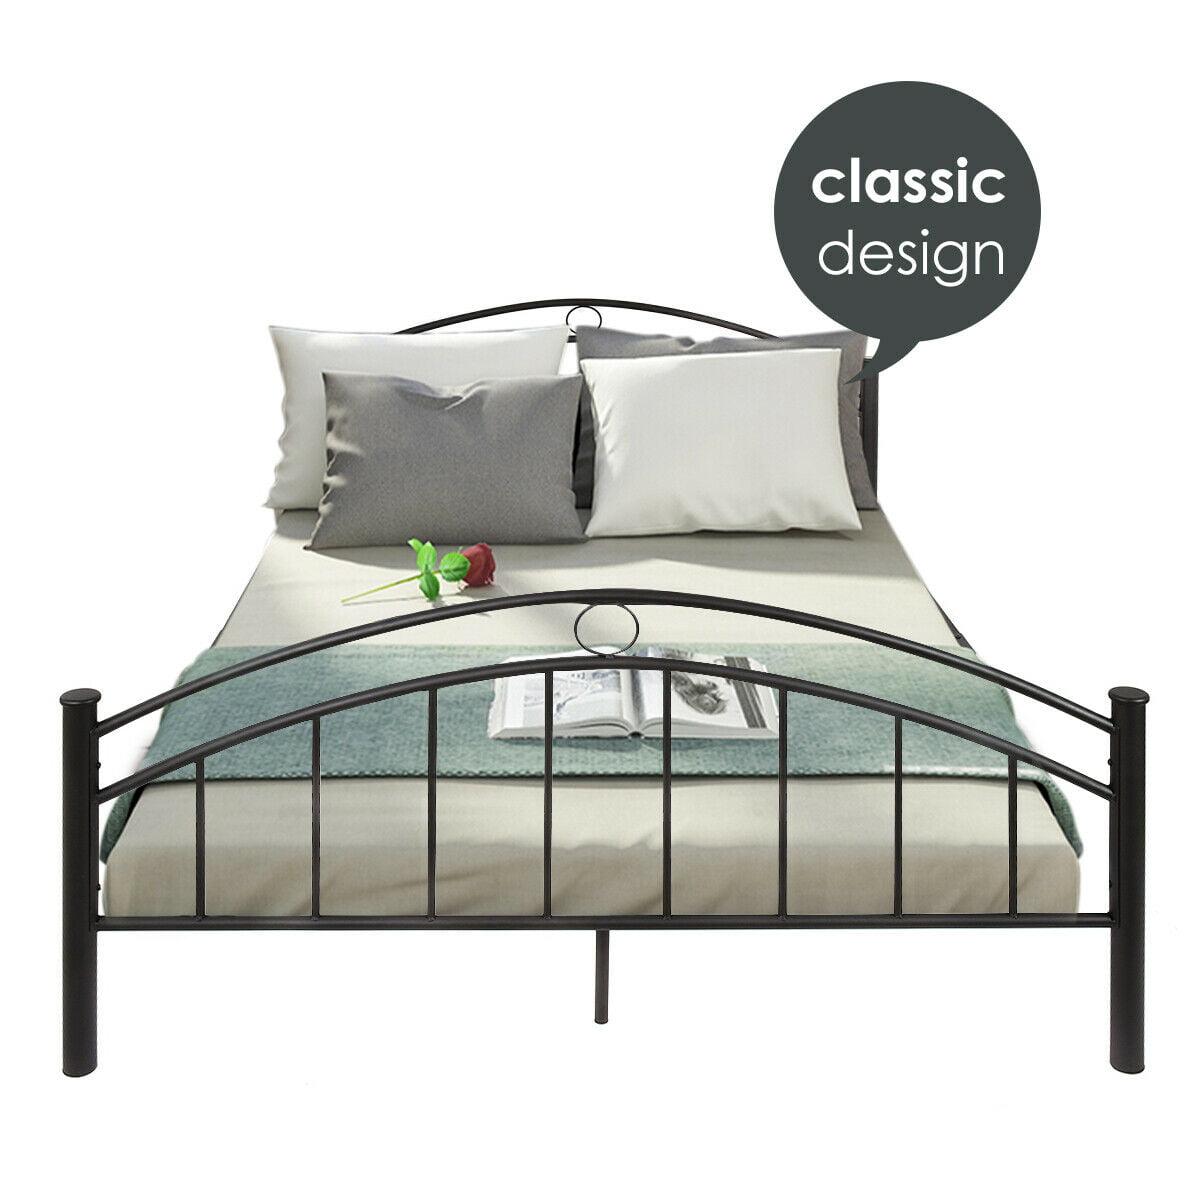 45d0e14ef9e5 Costway Queen Size Metal Bed Frame Mattress Platform Headboard Black |  Walmart Canada